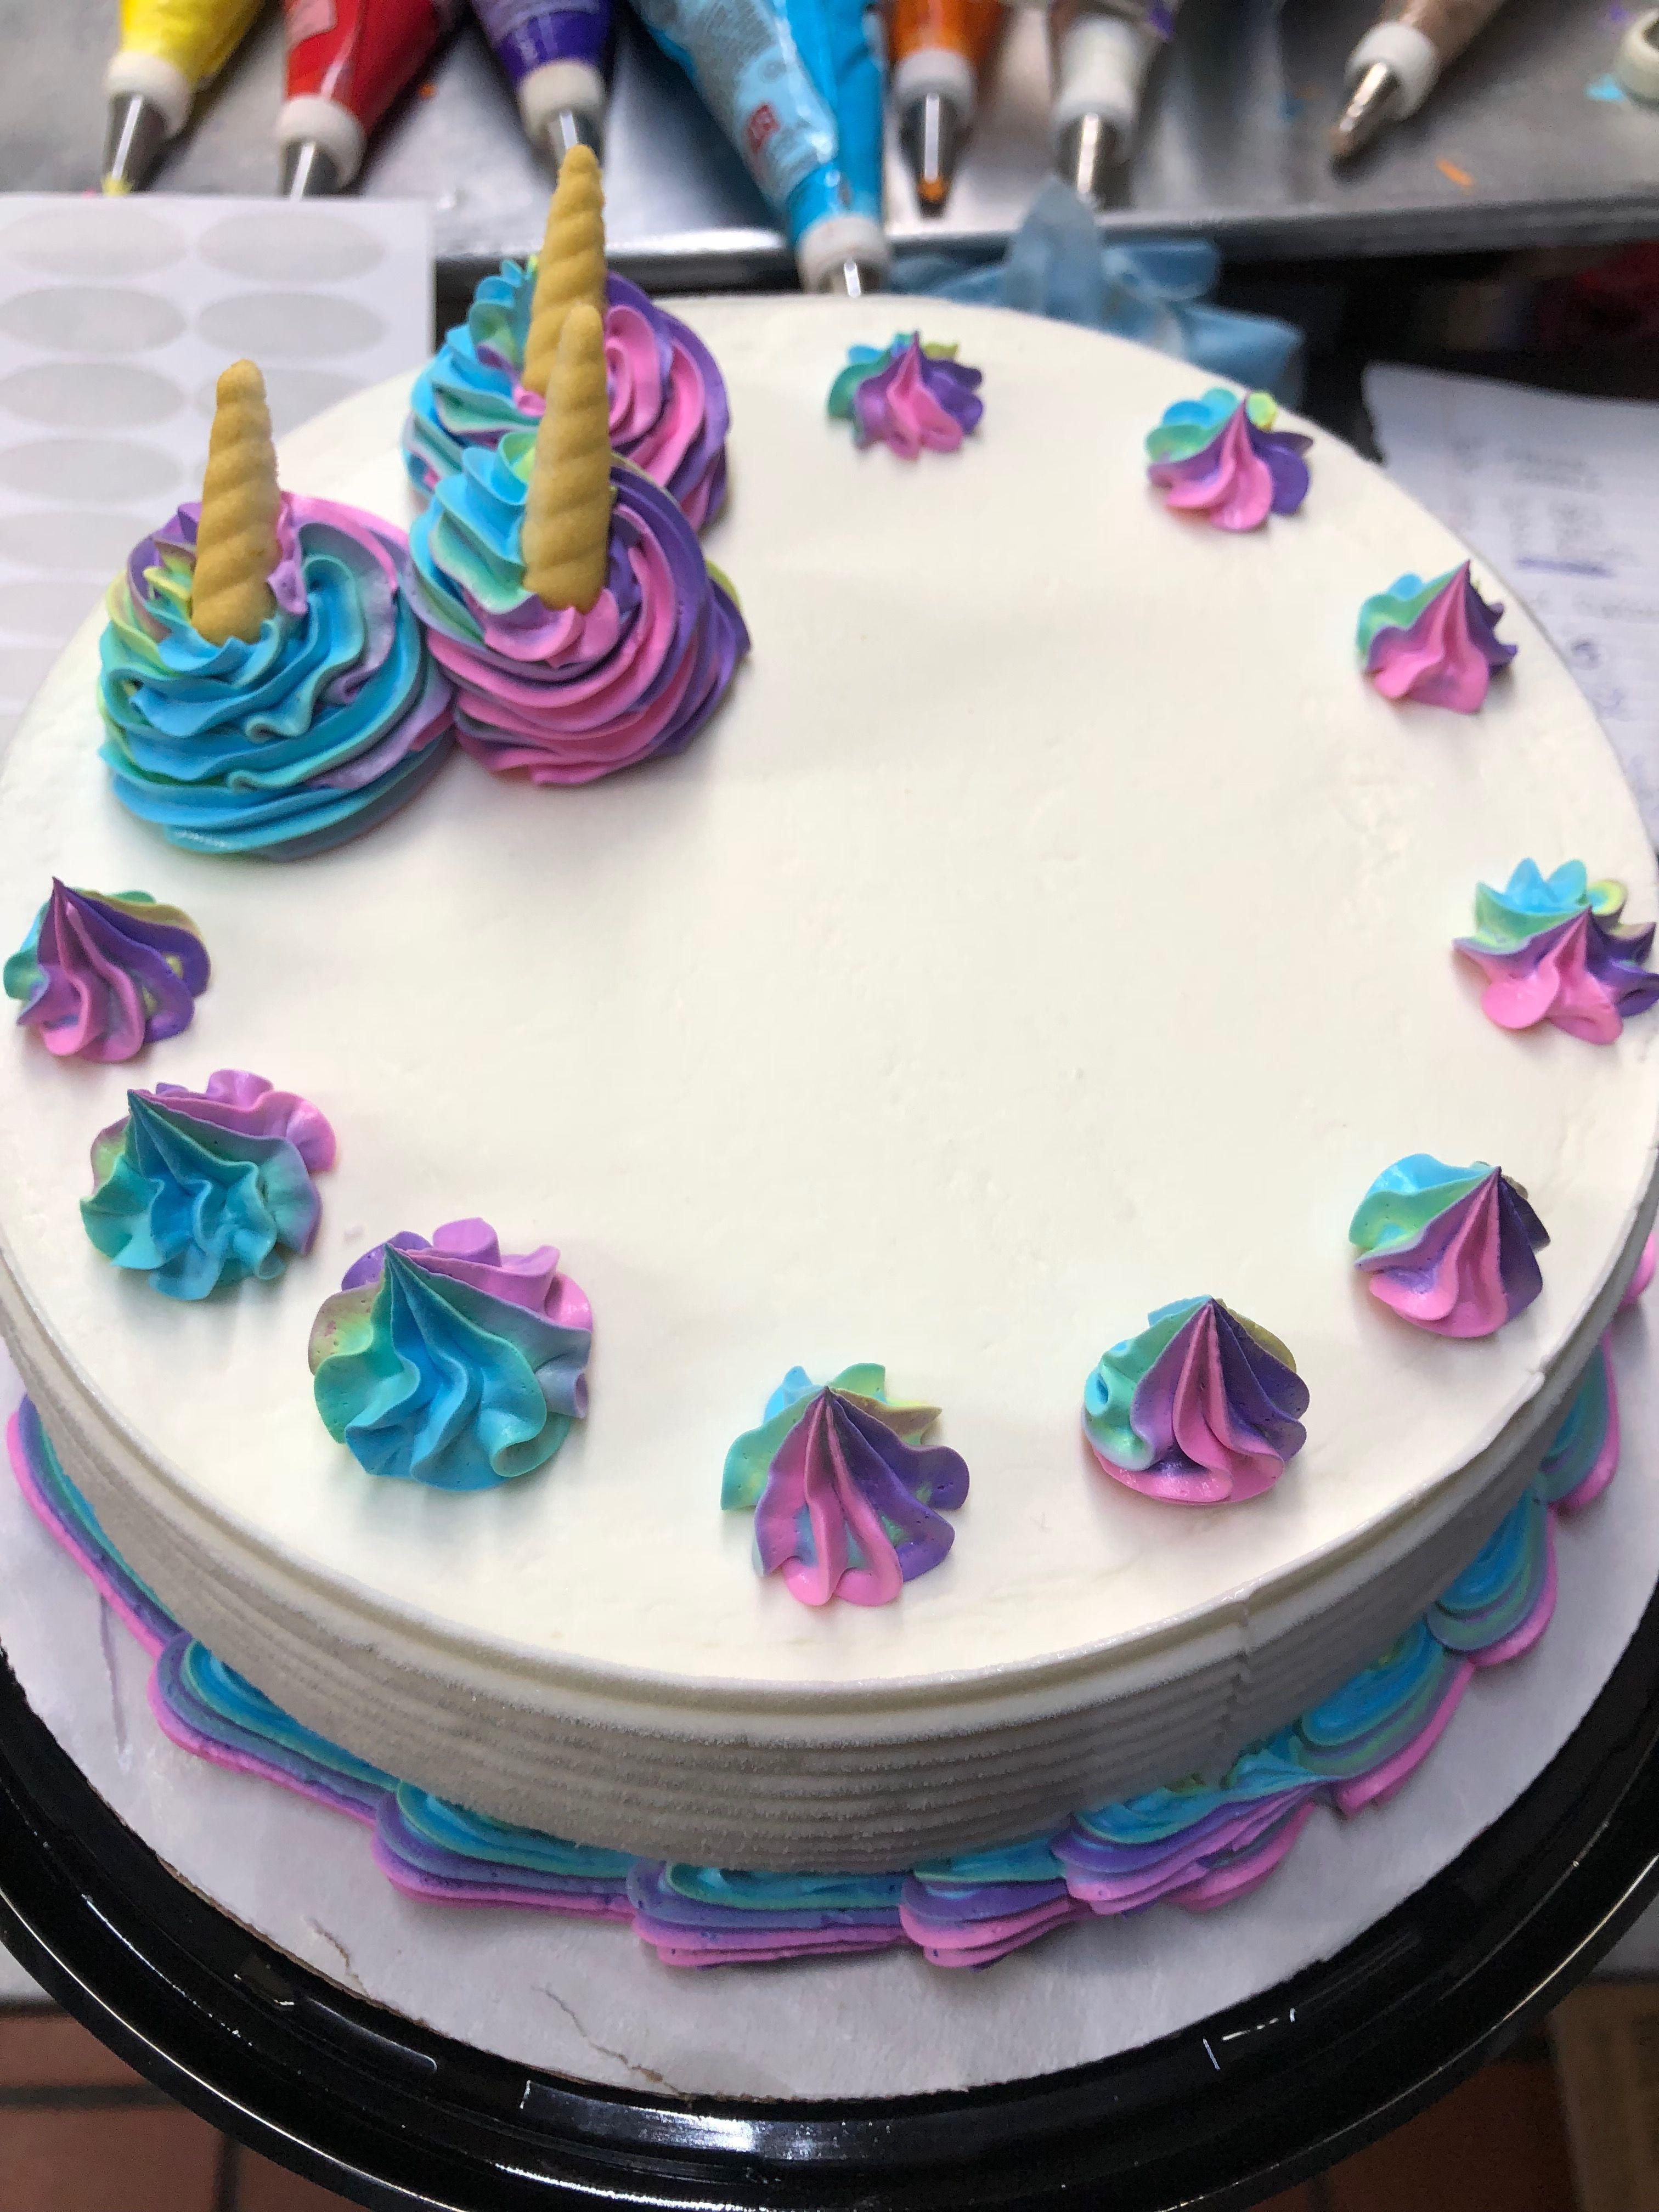 Remarkable Unicorn Cakes Dairy Queen Unicorn Cake Personalised Birthday Cards Epsylily Jamesorg